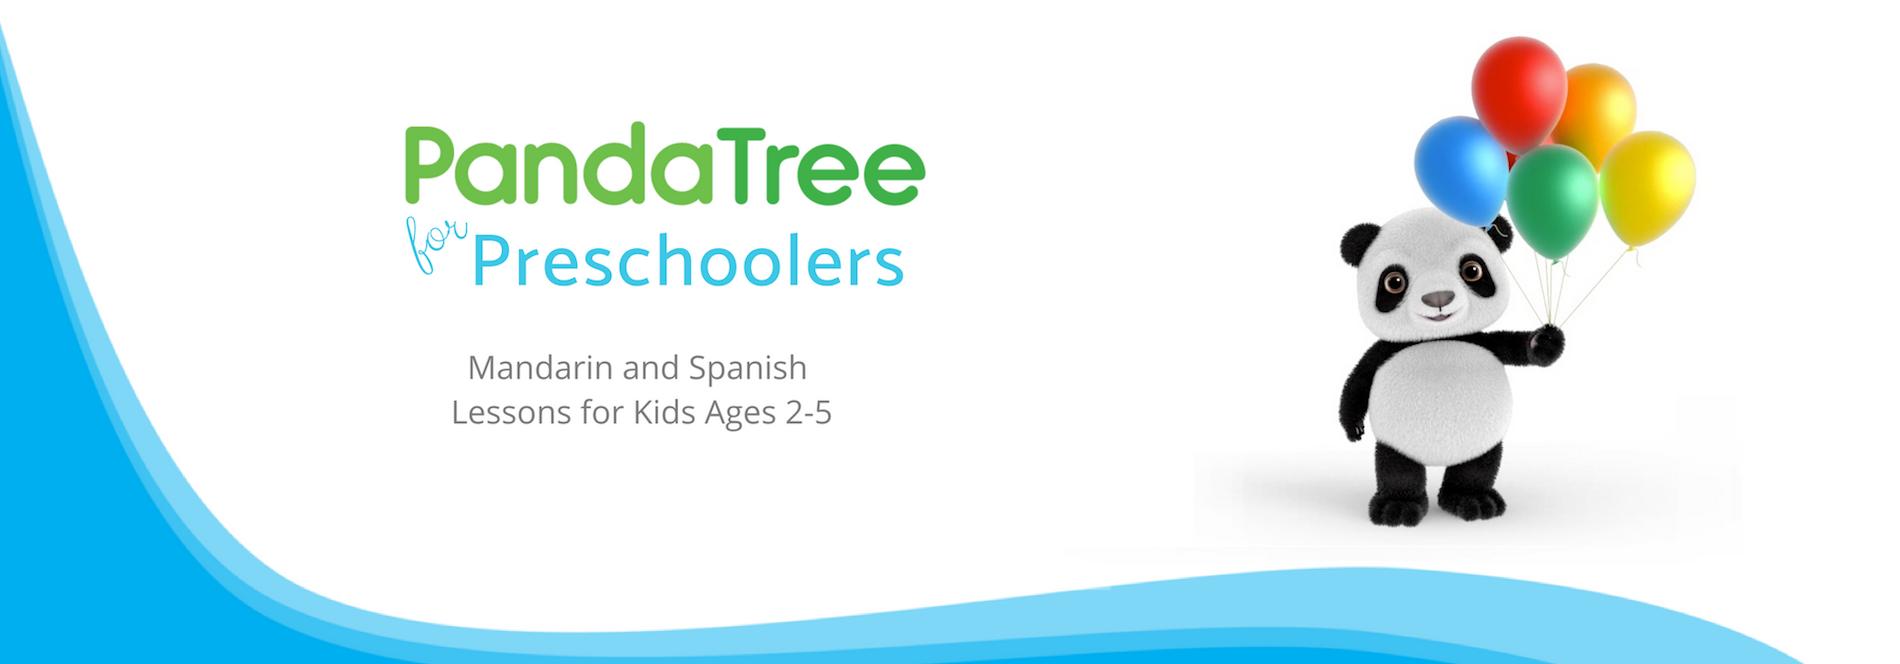 Pandatree Preschool Program